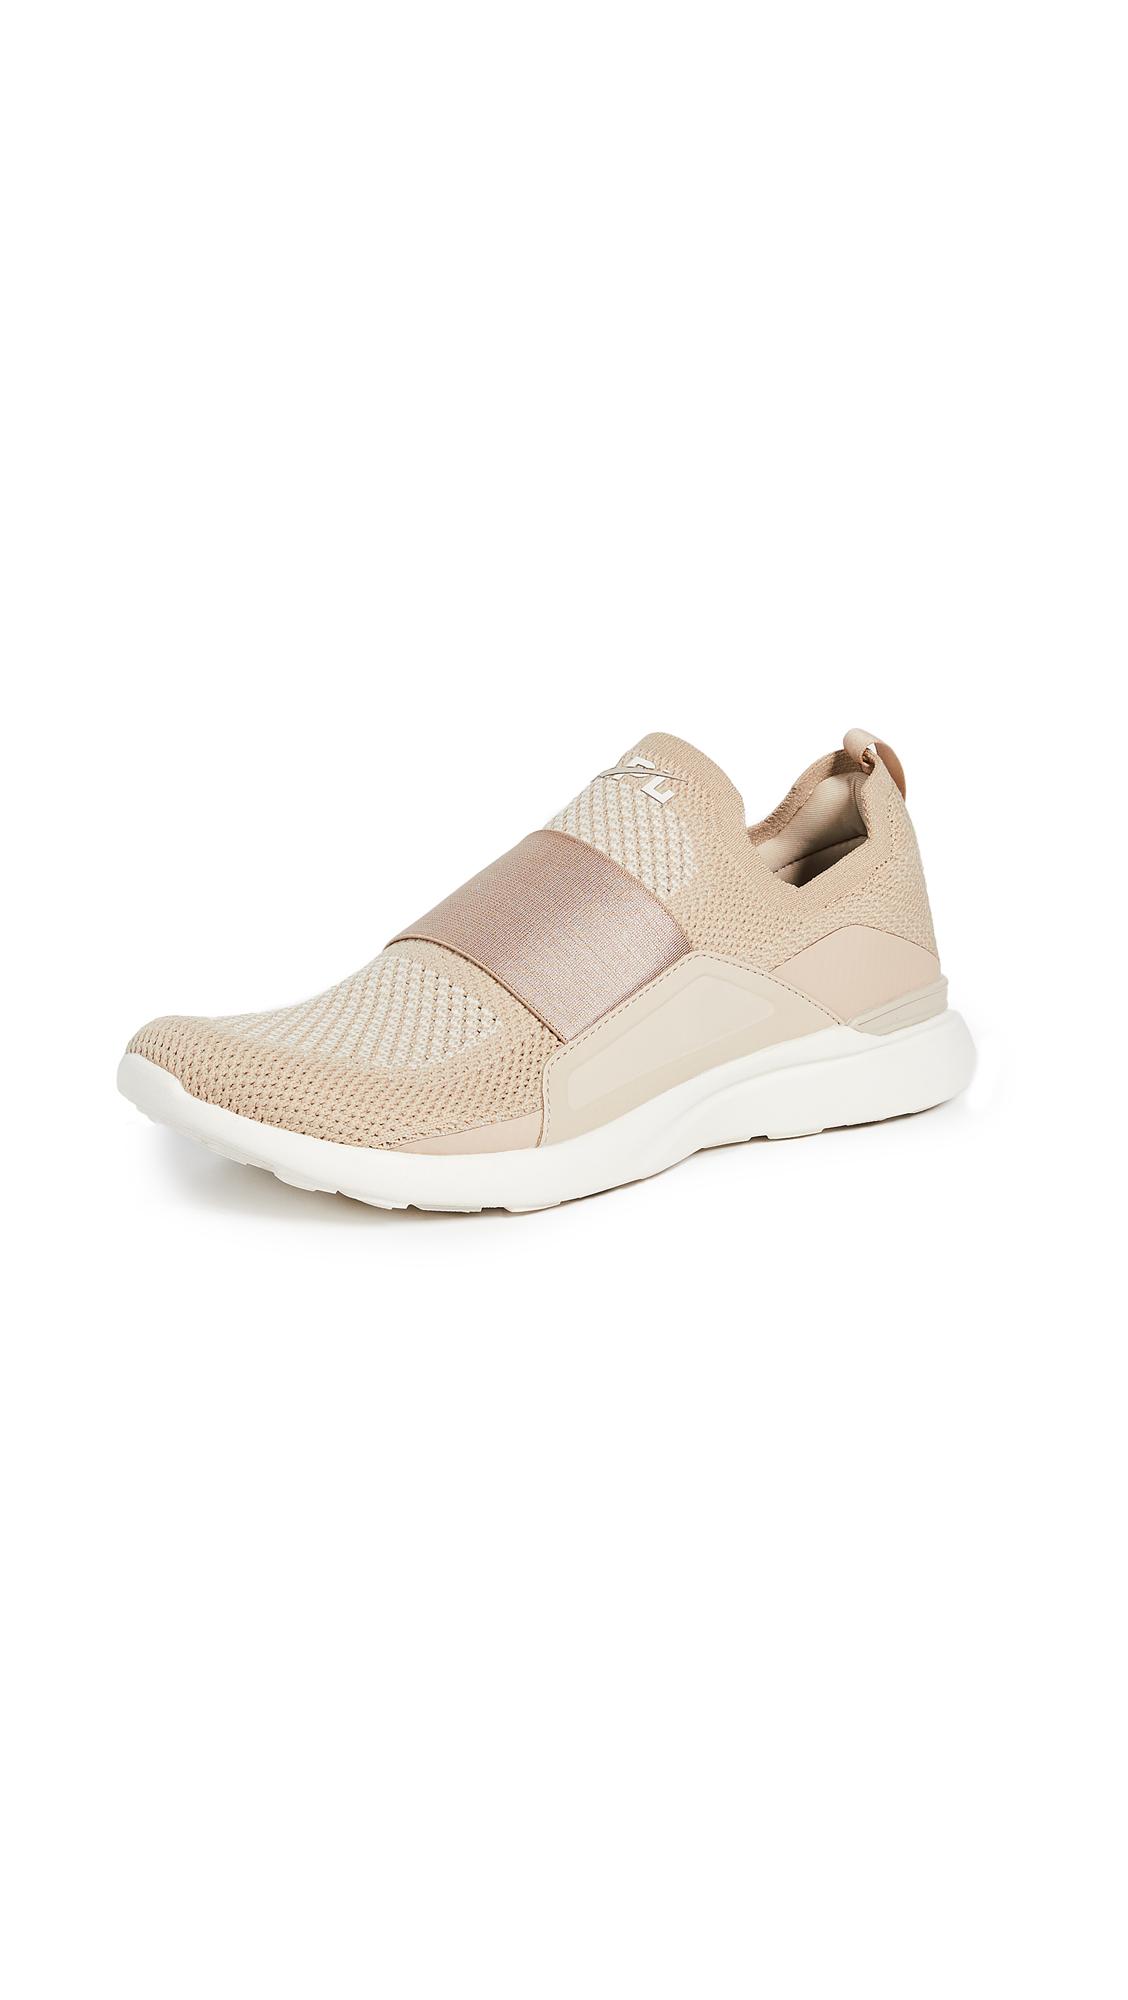 APL: Athletic Propulsion Labs TechLoom Bliss Sneakers - Irish Cream/Parchment/Pristine